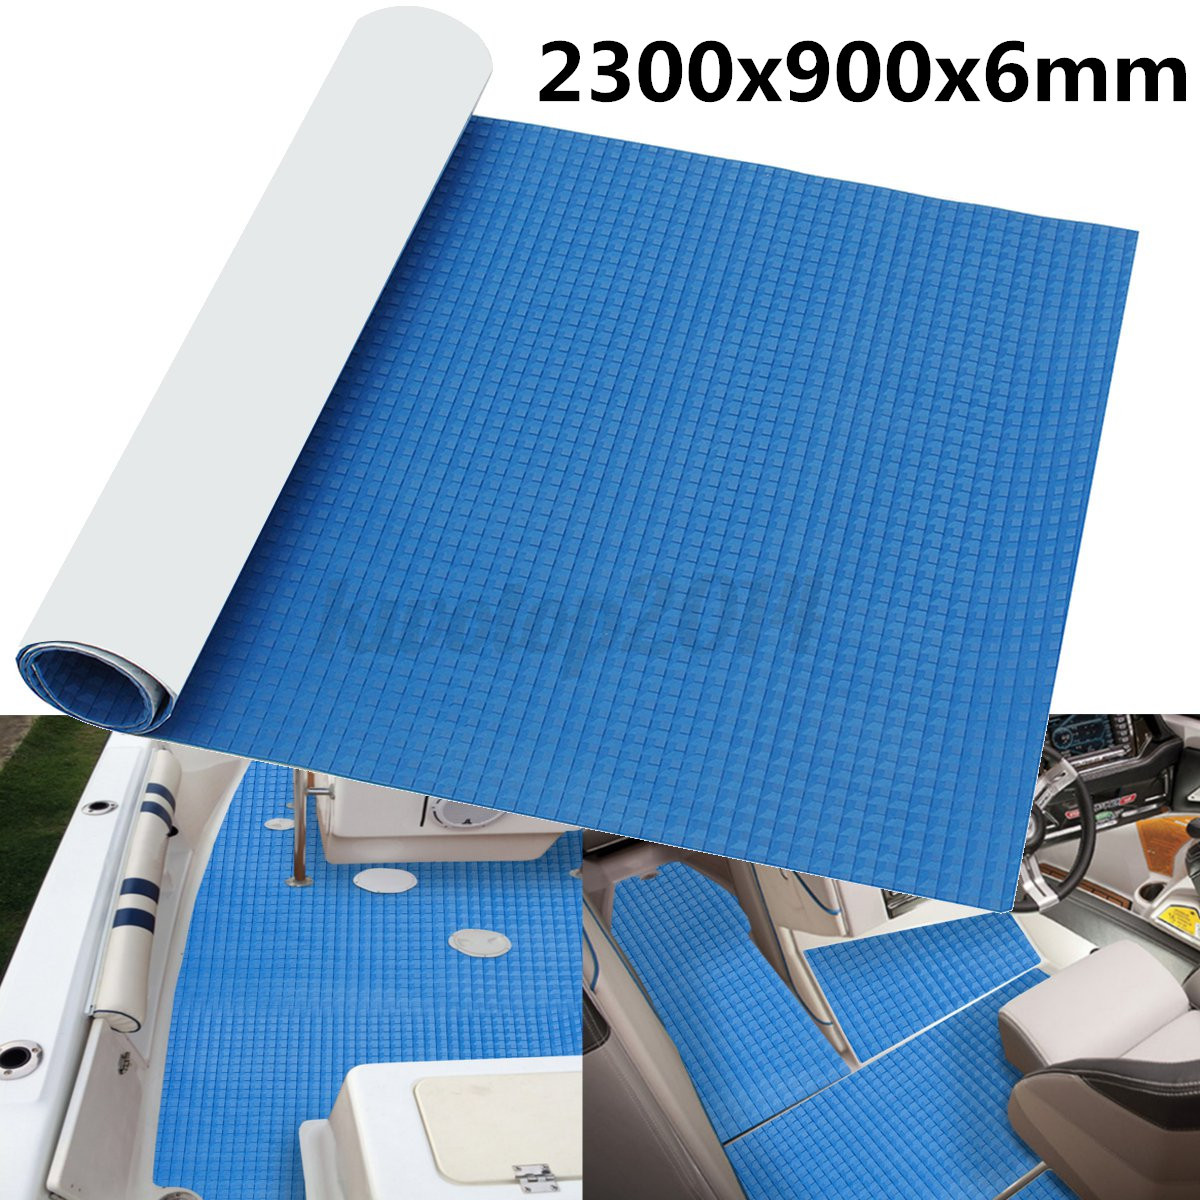 EVA Foam Boat Foam Teak Decking Pad Kayak Flooring Sheet 5mm Marine Mat Blue